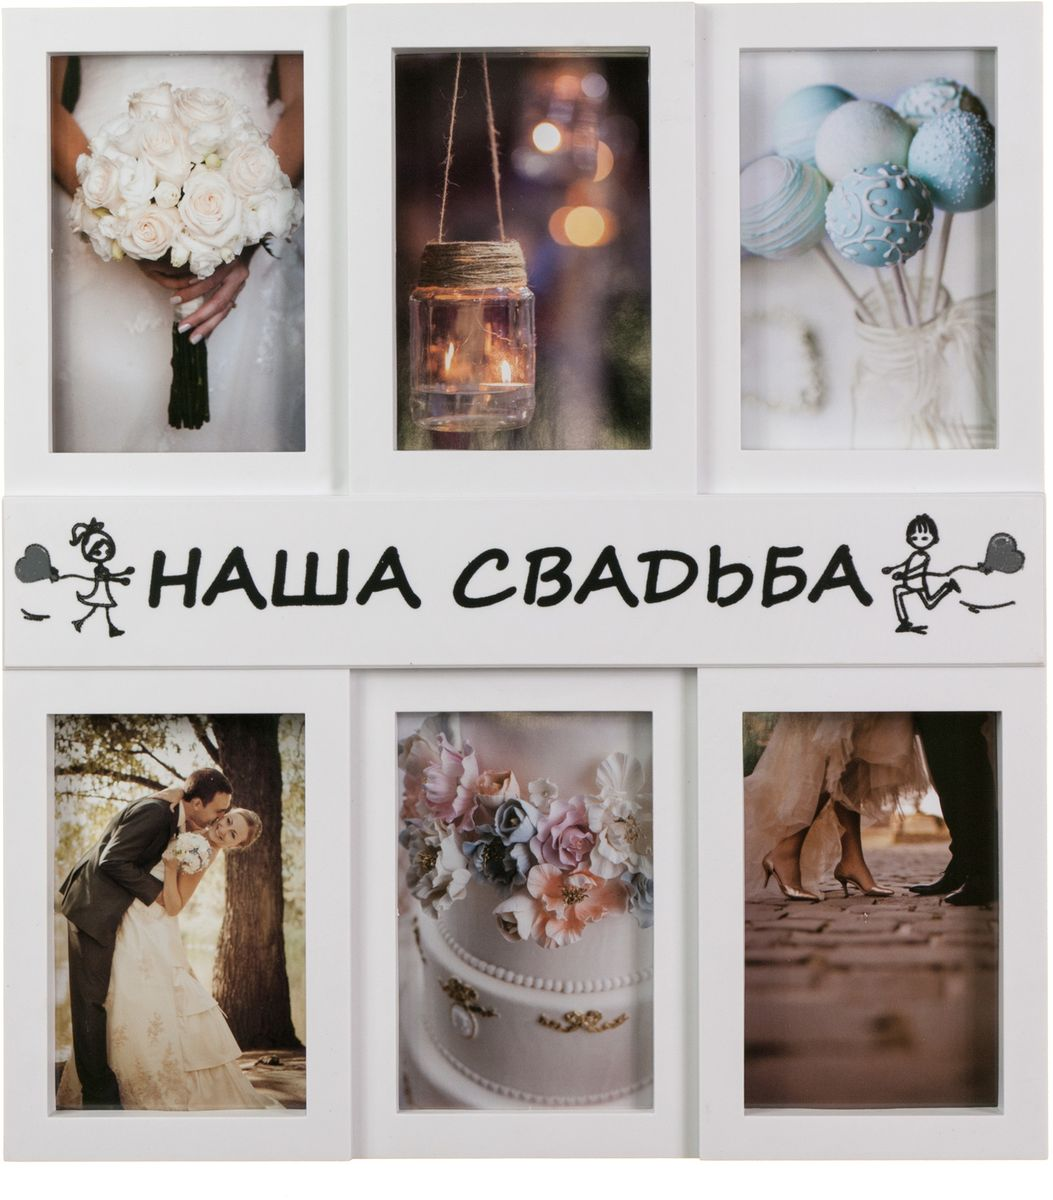 Фоторамка Platinum Наша свадьба, цвет: белый, на 6 фото, 10 х 15 см. BG-2522 фоторамка коллаж platinum 8 фото 10 х 15 см цвет белый золотистый